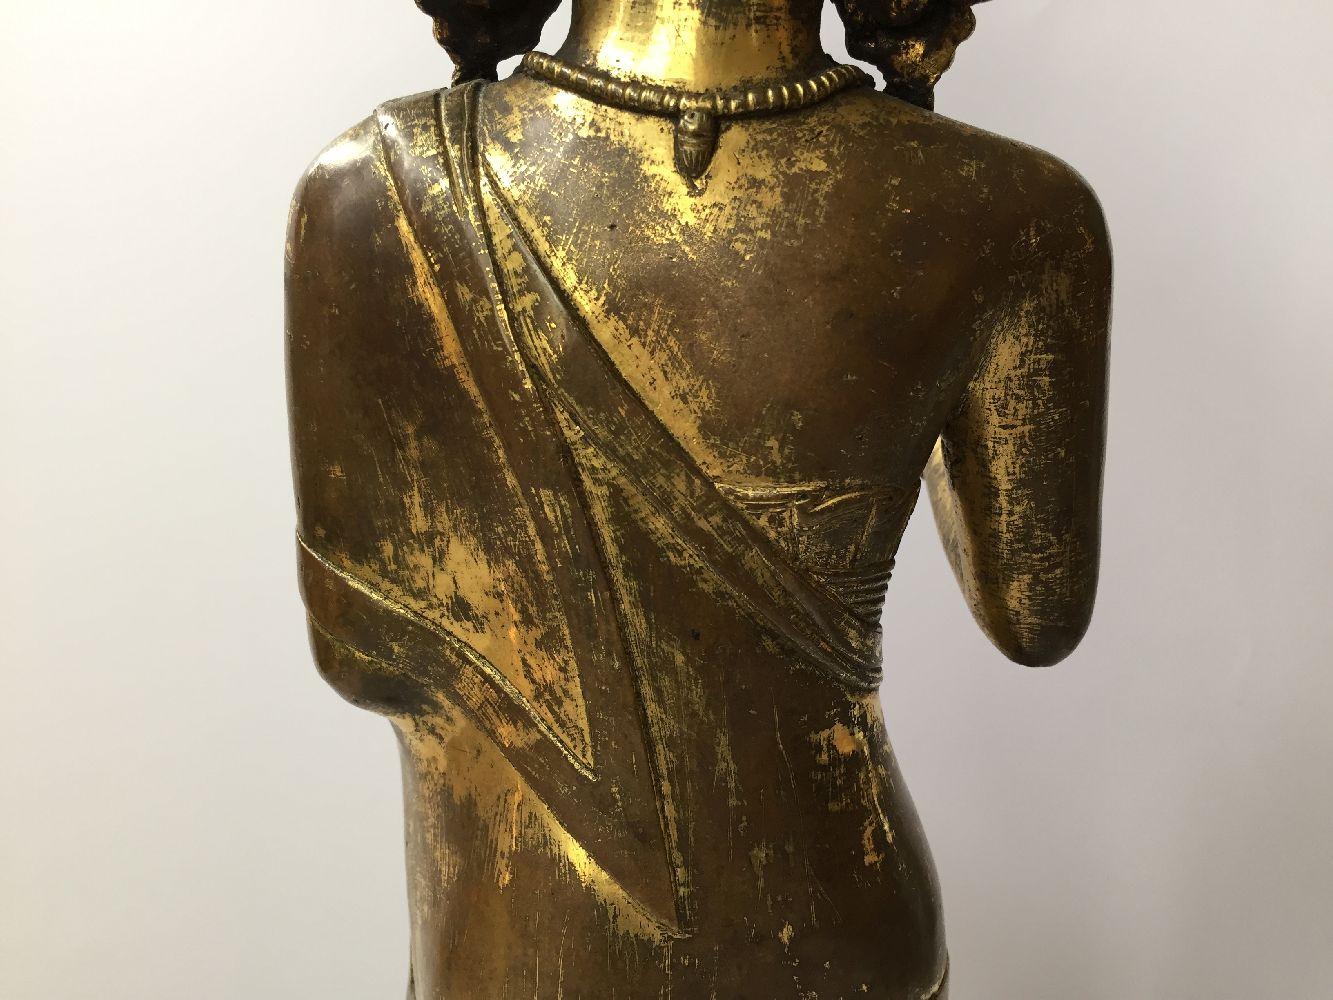 A large Sino-Tibetan gilt bronze standing figure of Avalokiteshvara, 17th century, the right hand is - Image 2 of 16